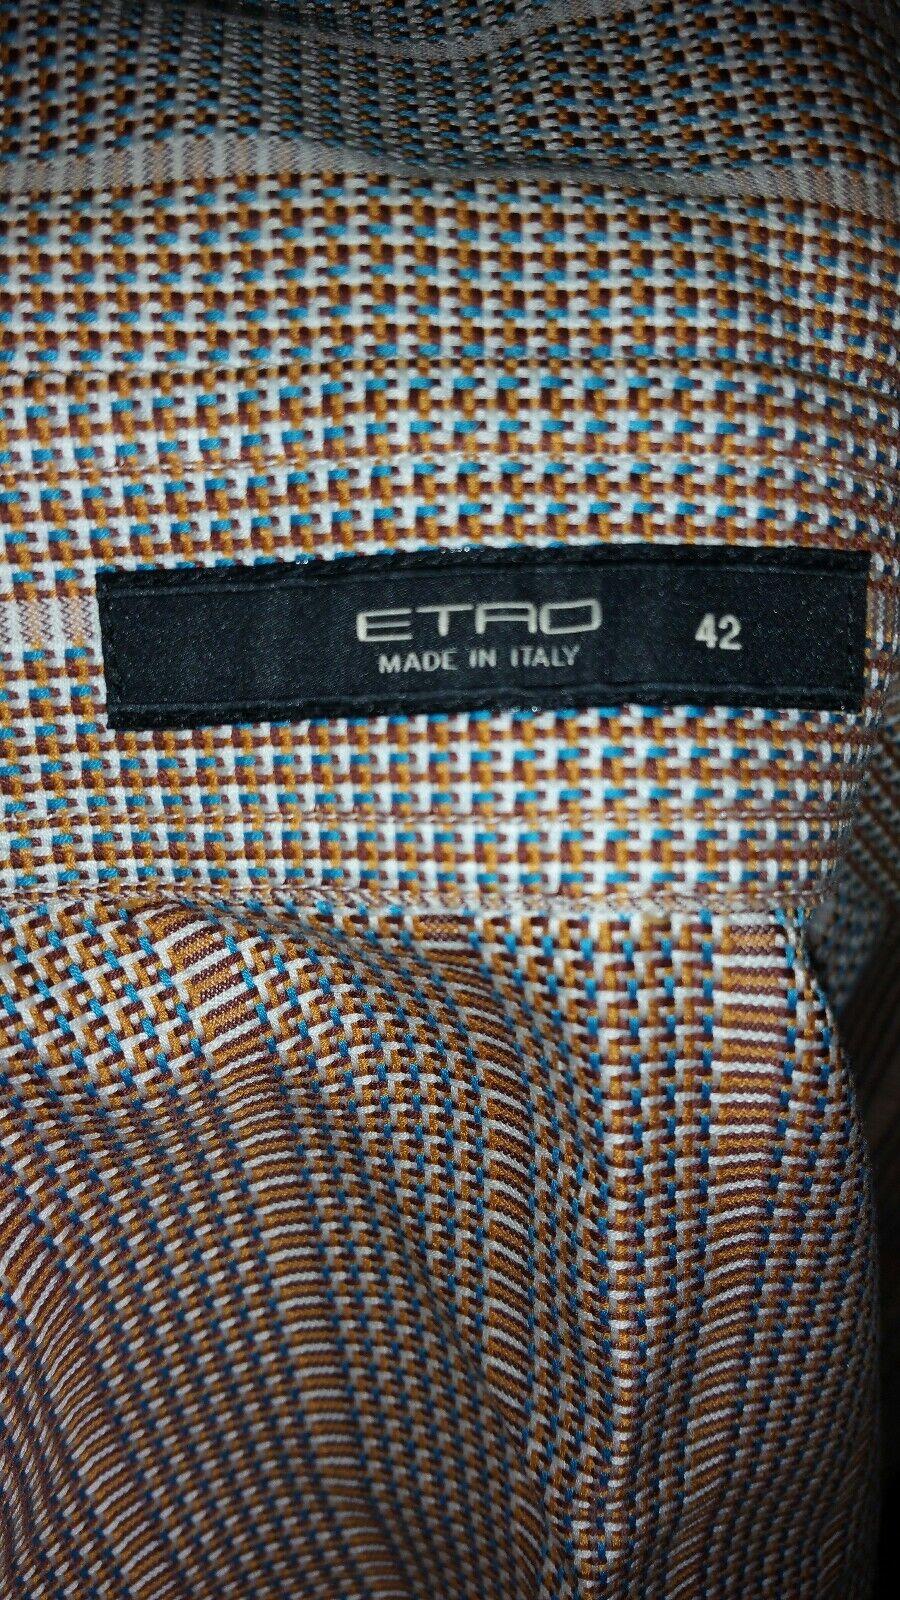 Etro Button Down Blouse Sz 42 braun Woven Material Excellent Condition